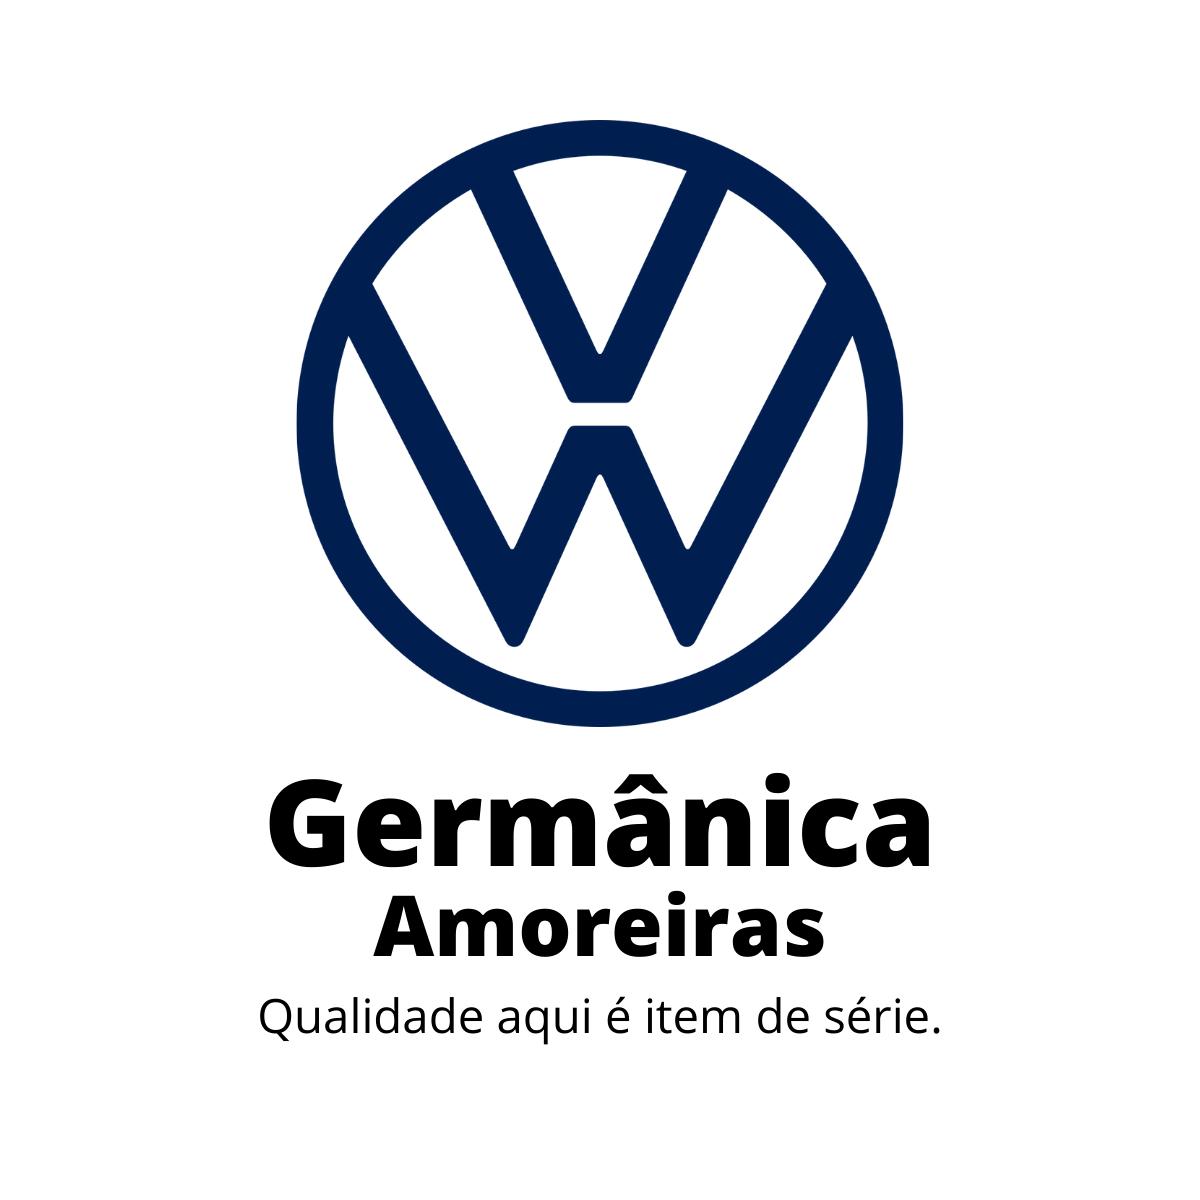 VWGERMANICACAMPINAS